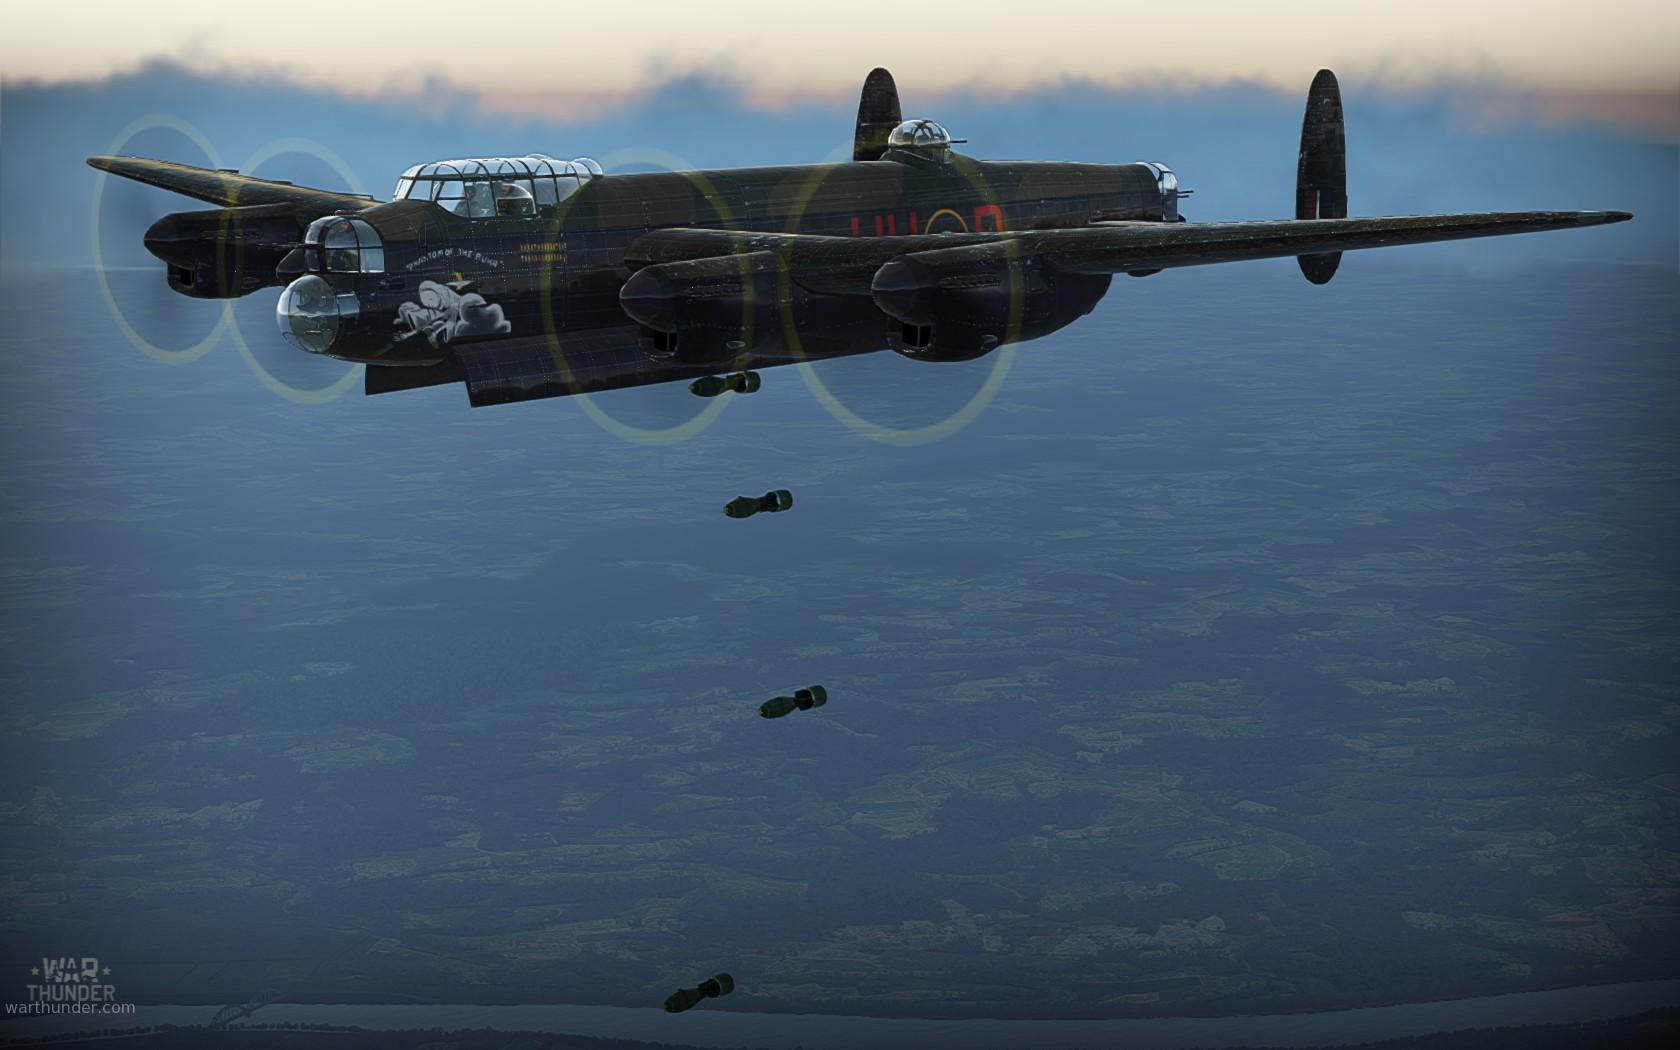 War thunder forum